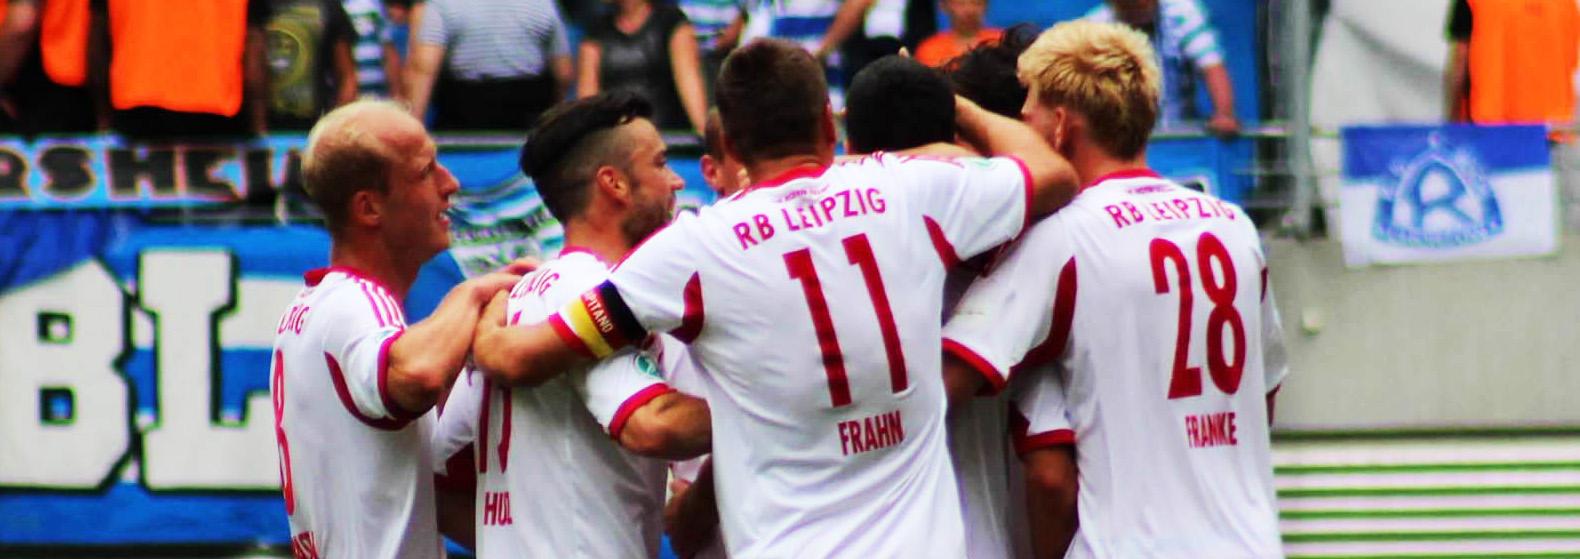 RB Leipzig - MSV Duisburg